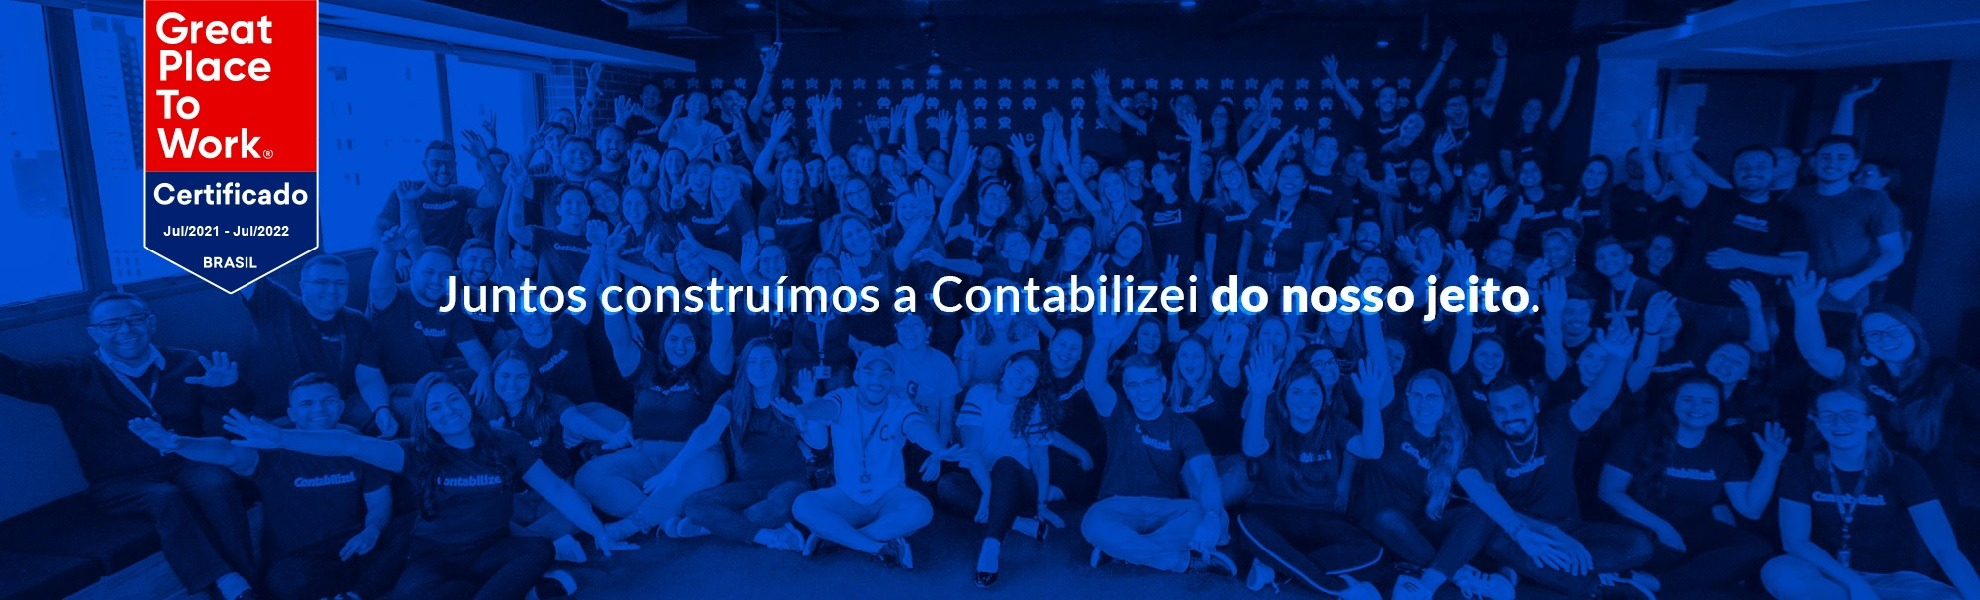 Consultor(a) de Vendas - Inside Sales - Social Selling